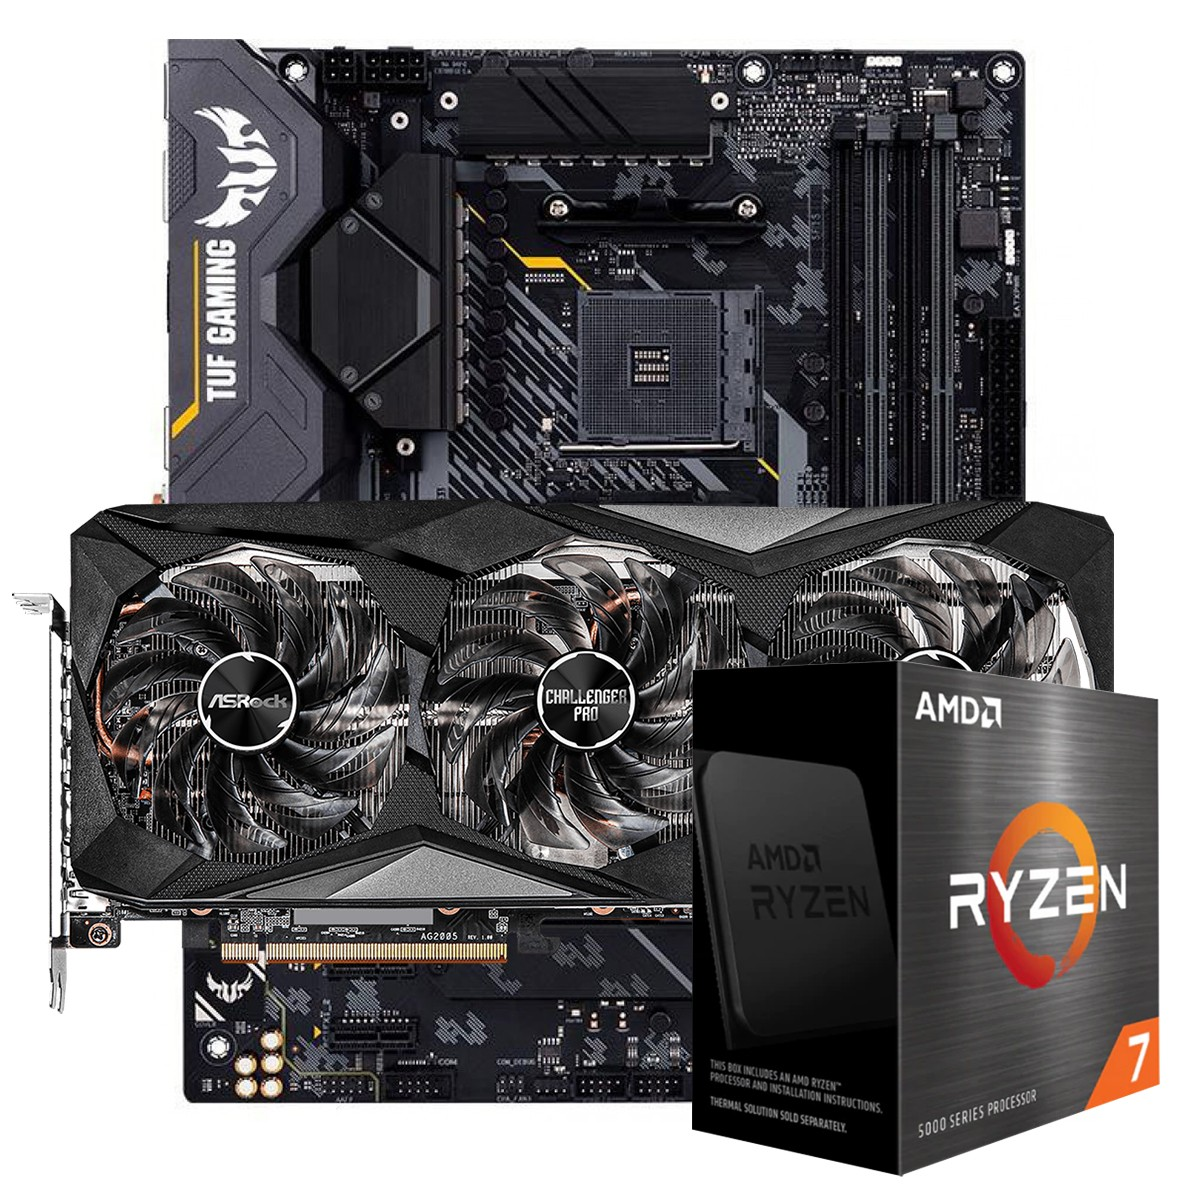 Kit Upgrade ASRock Radeon RX 6700 XT Challenger Pro OC + AMD Ryzen 7 5800X + ASUS TUF Gaming X570-Plus